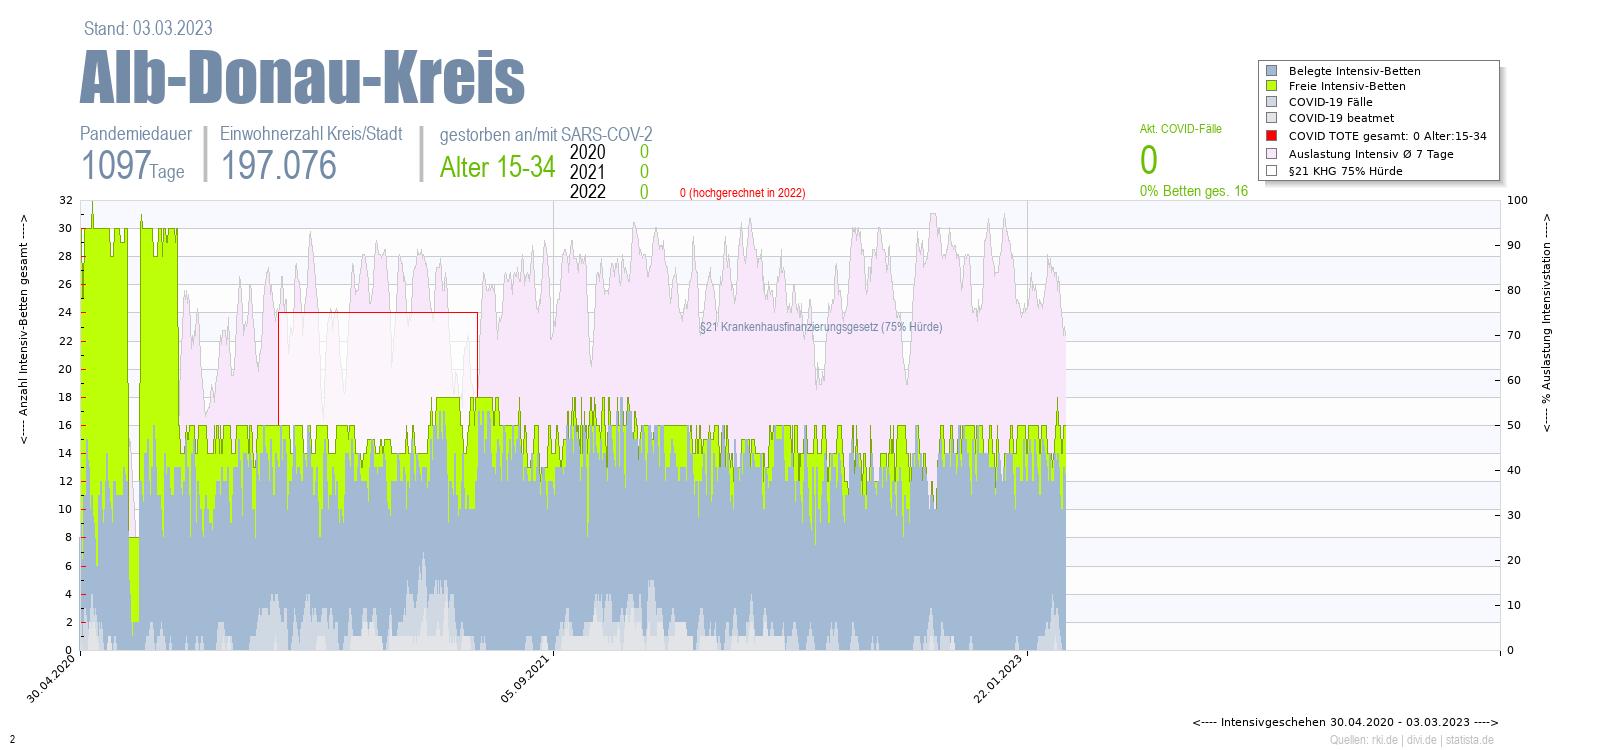 Intensivstation Auslastung Alb-Donau-Kreis Alter 0-4